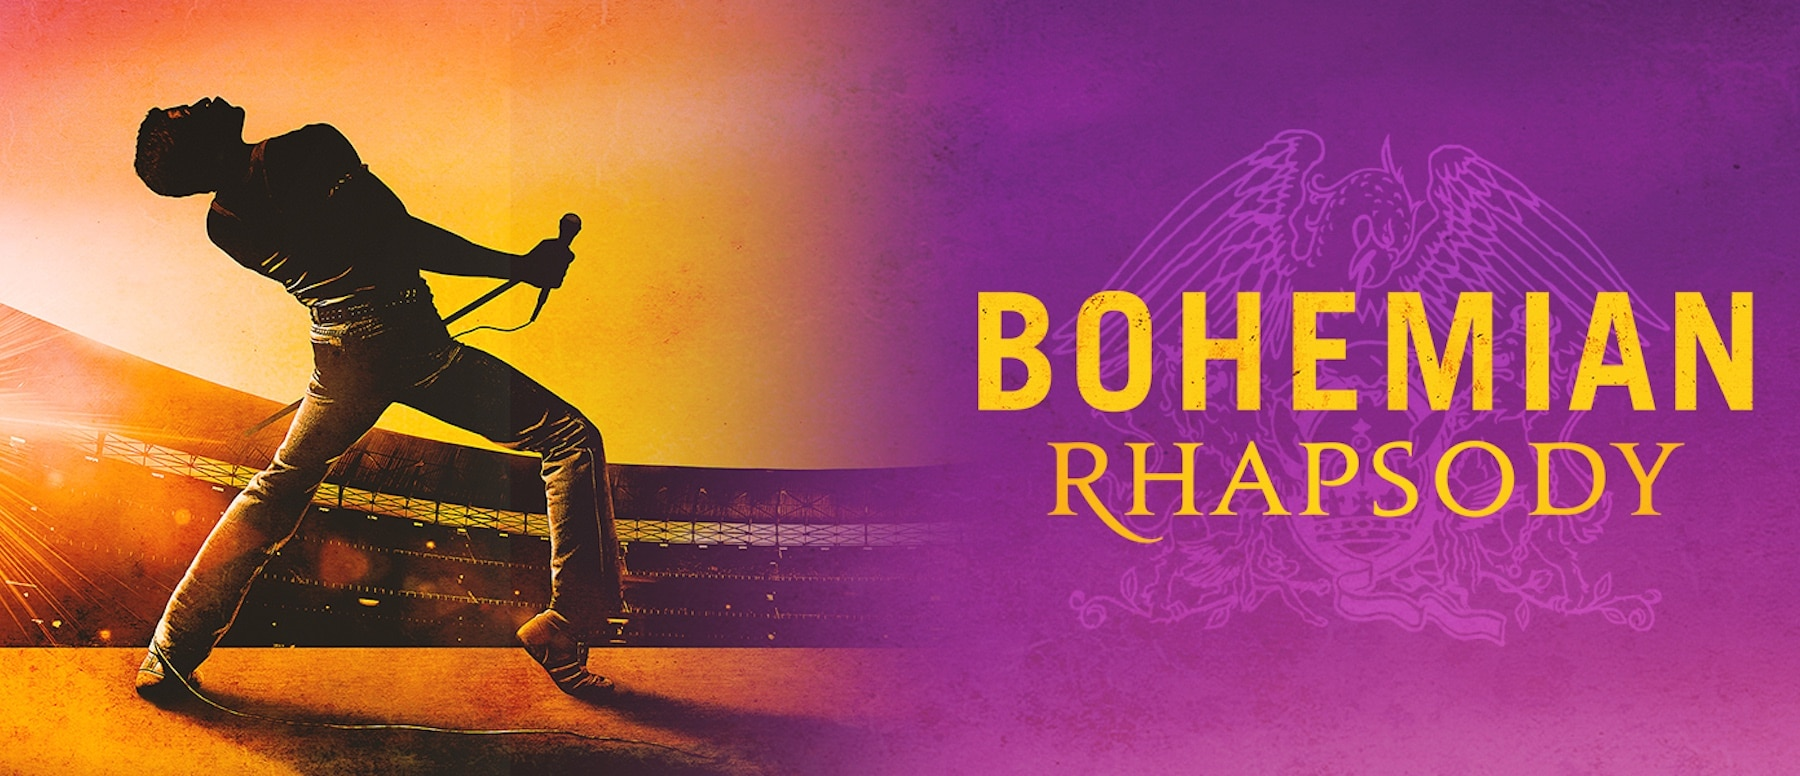 Tiongkok Hilangkan Referensi Homoseksual Dalam Film Bohemian Rhapsody |  EXPLOID